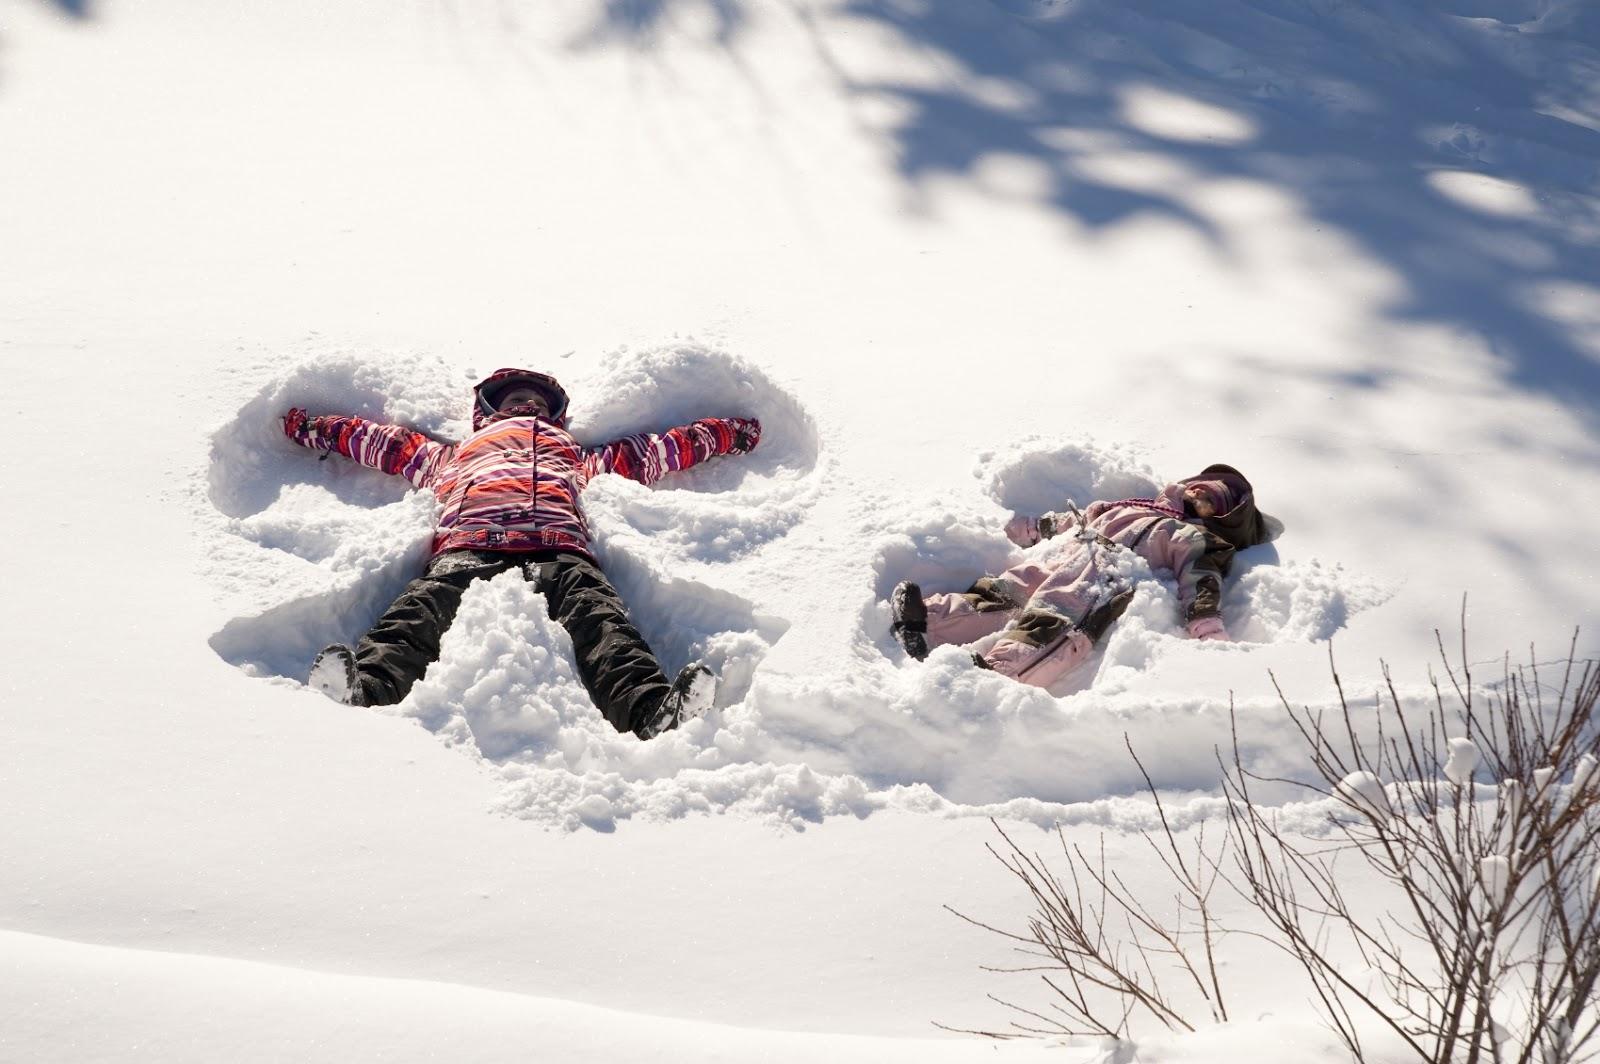 http://www.picturesofbabies.net/wp-content/uploads/2015/01/snow-angels.jpg